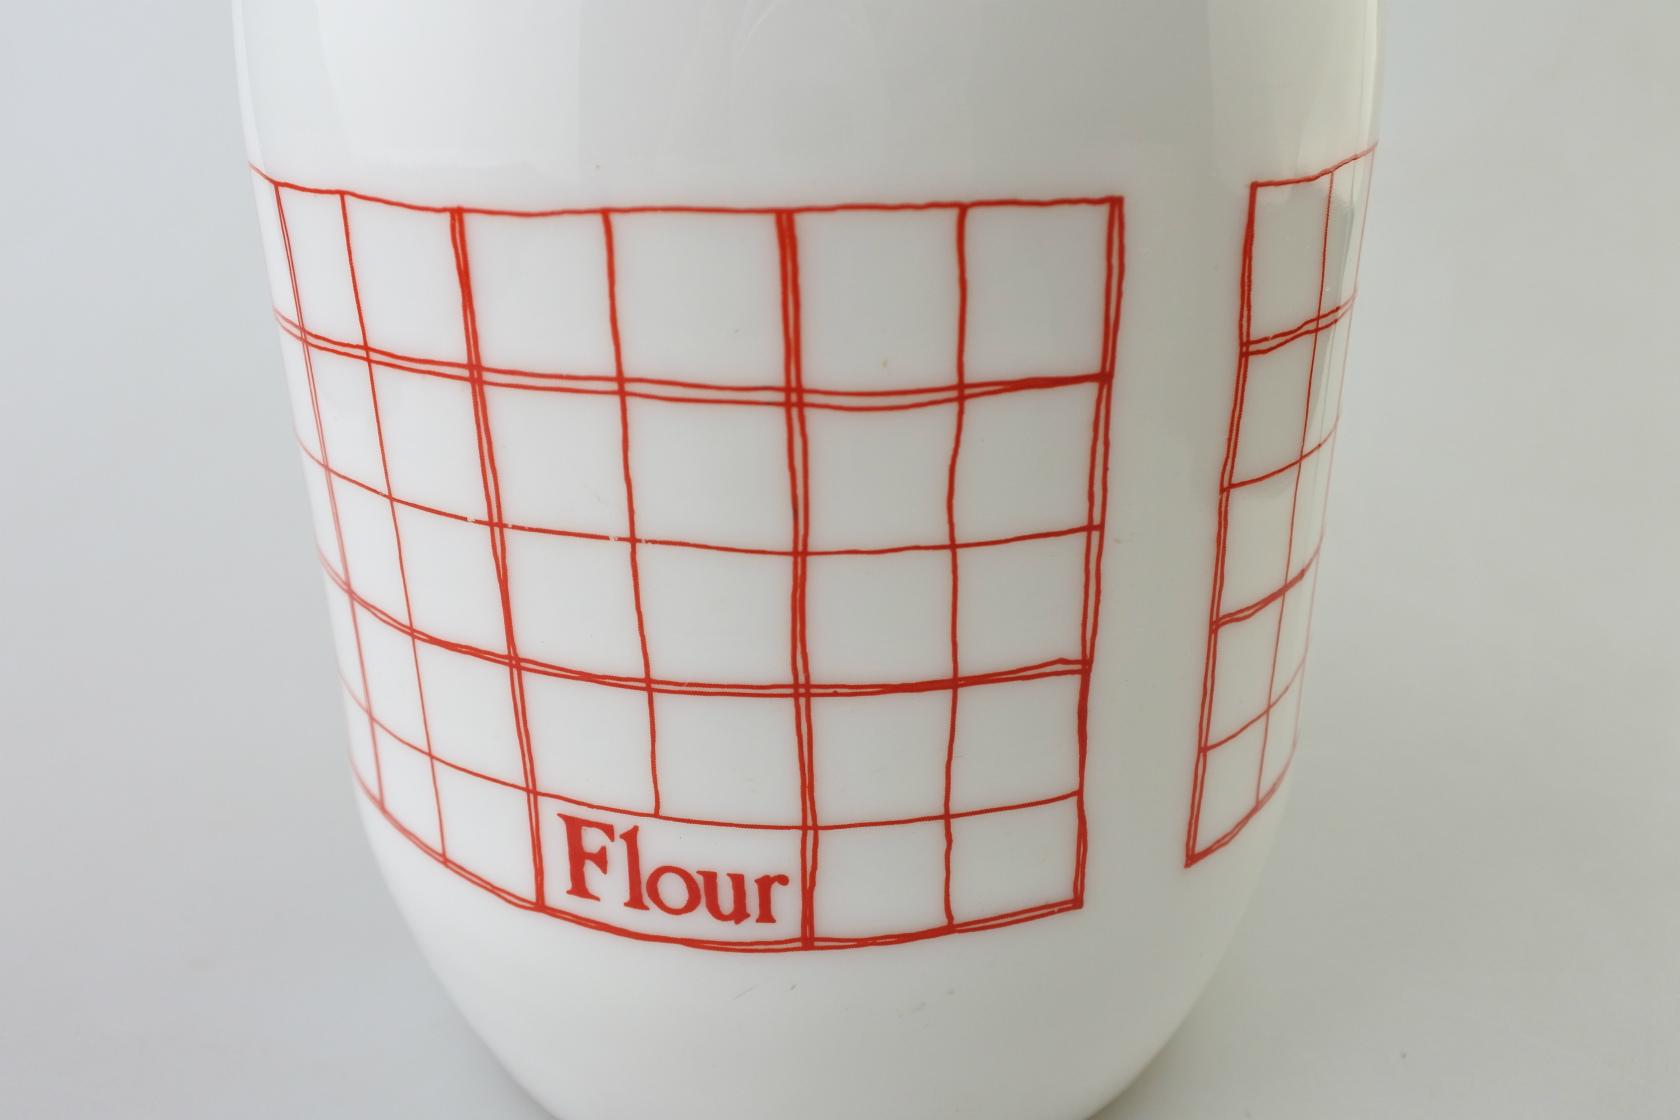 vi-wheaton-canister-flour